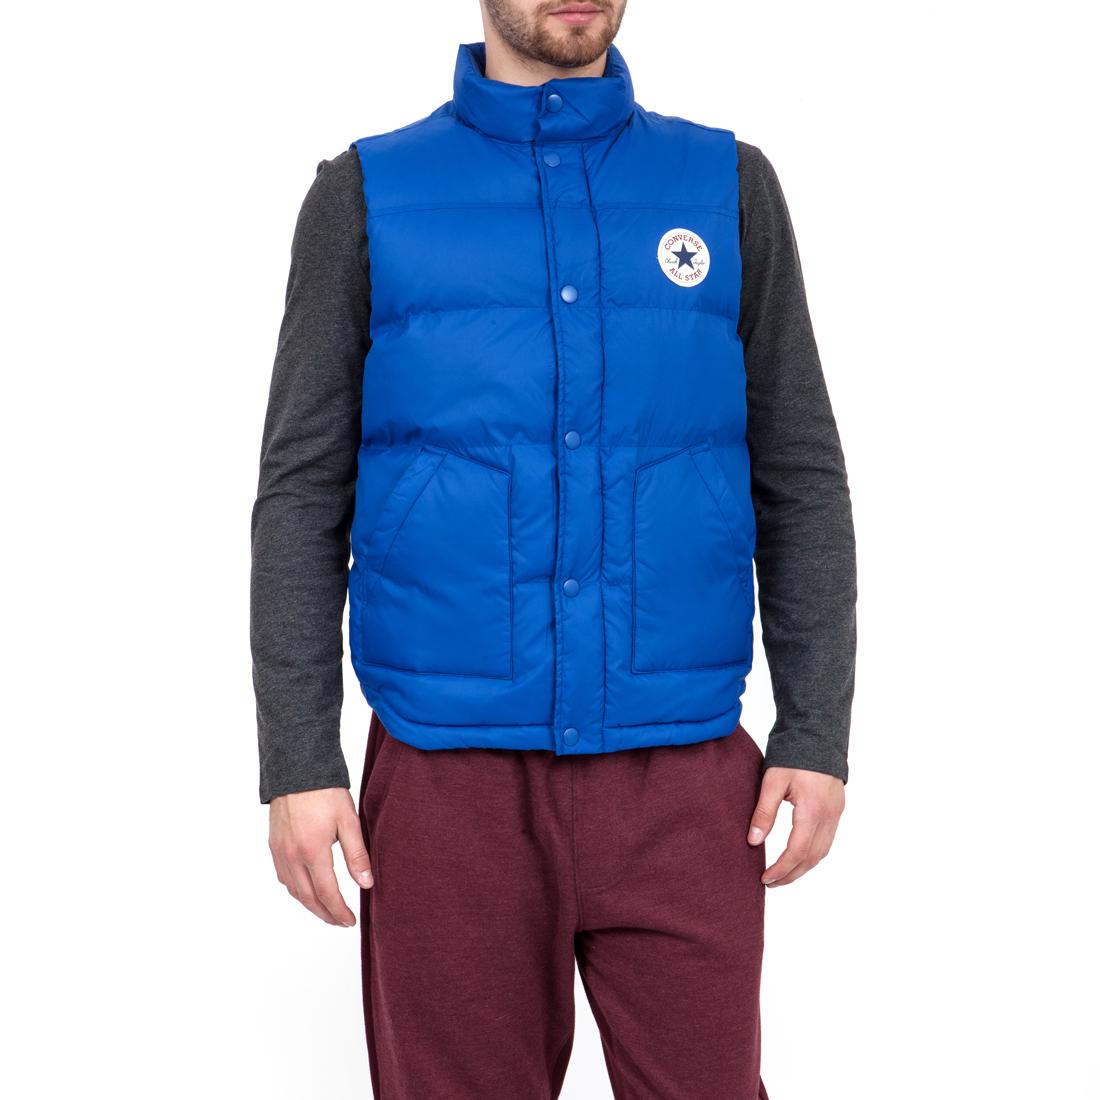 CONVERSE - Ανδρικό μπουφάν Converse μπλε ανδρικά ρούχα πανωφόρια γιλέκα